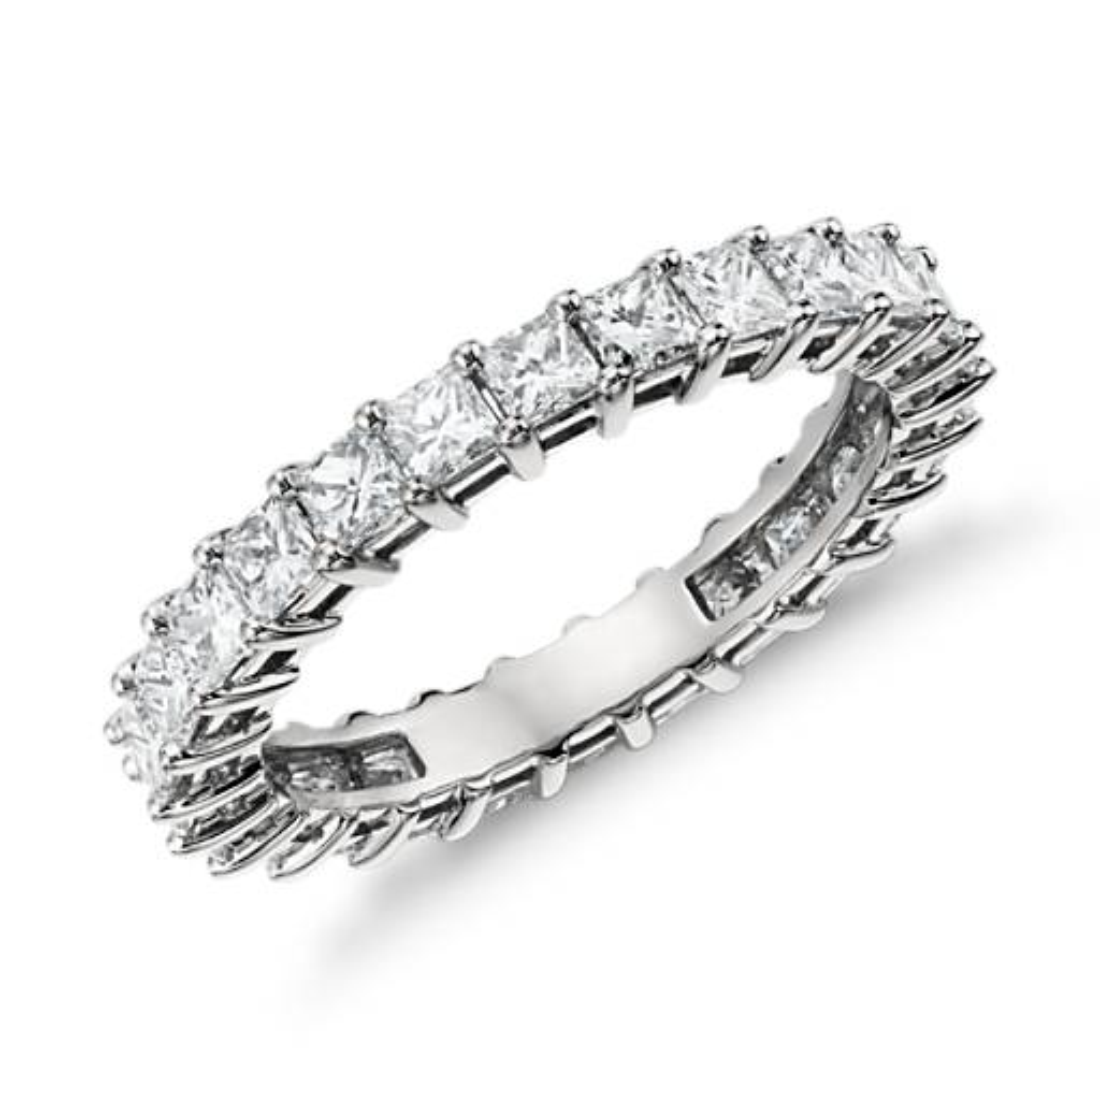 Anillo de eternidad de diamantes de talla princesa en platino (2 qt. total)